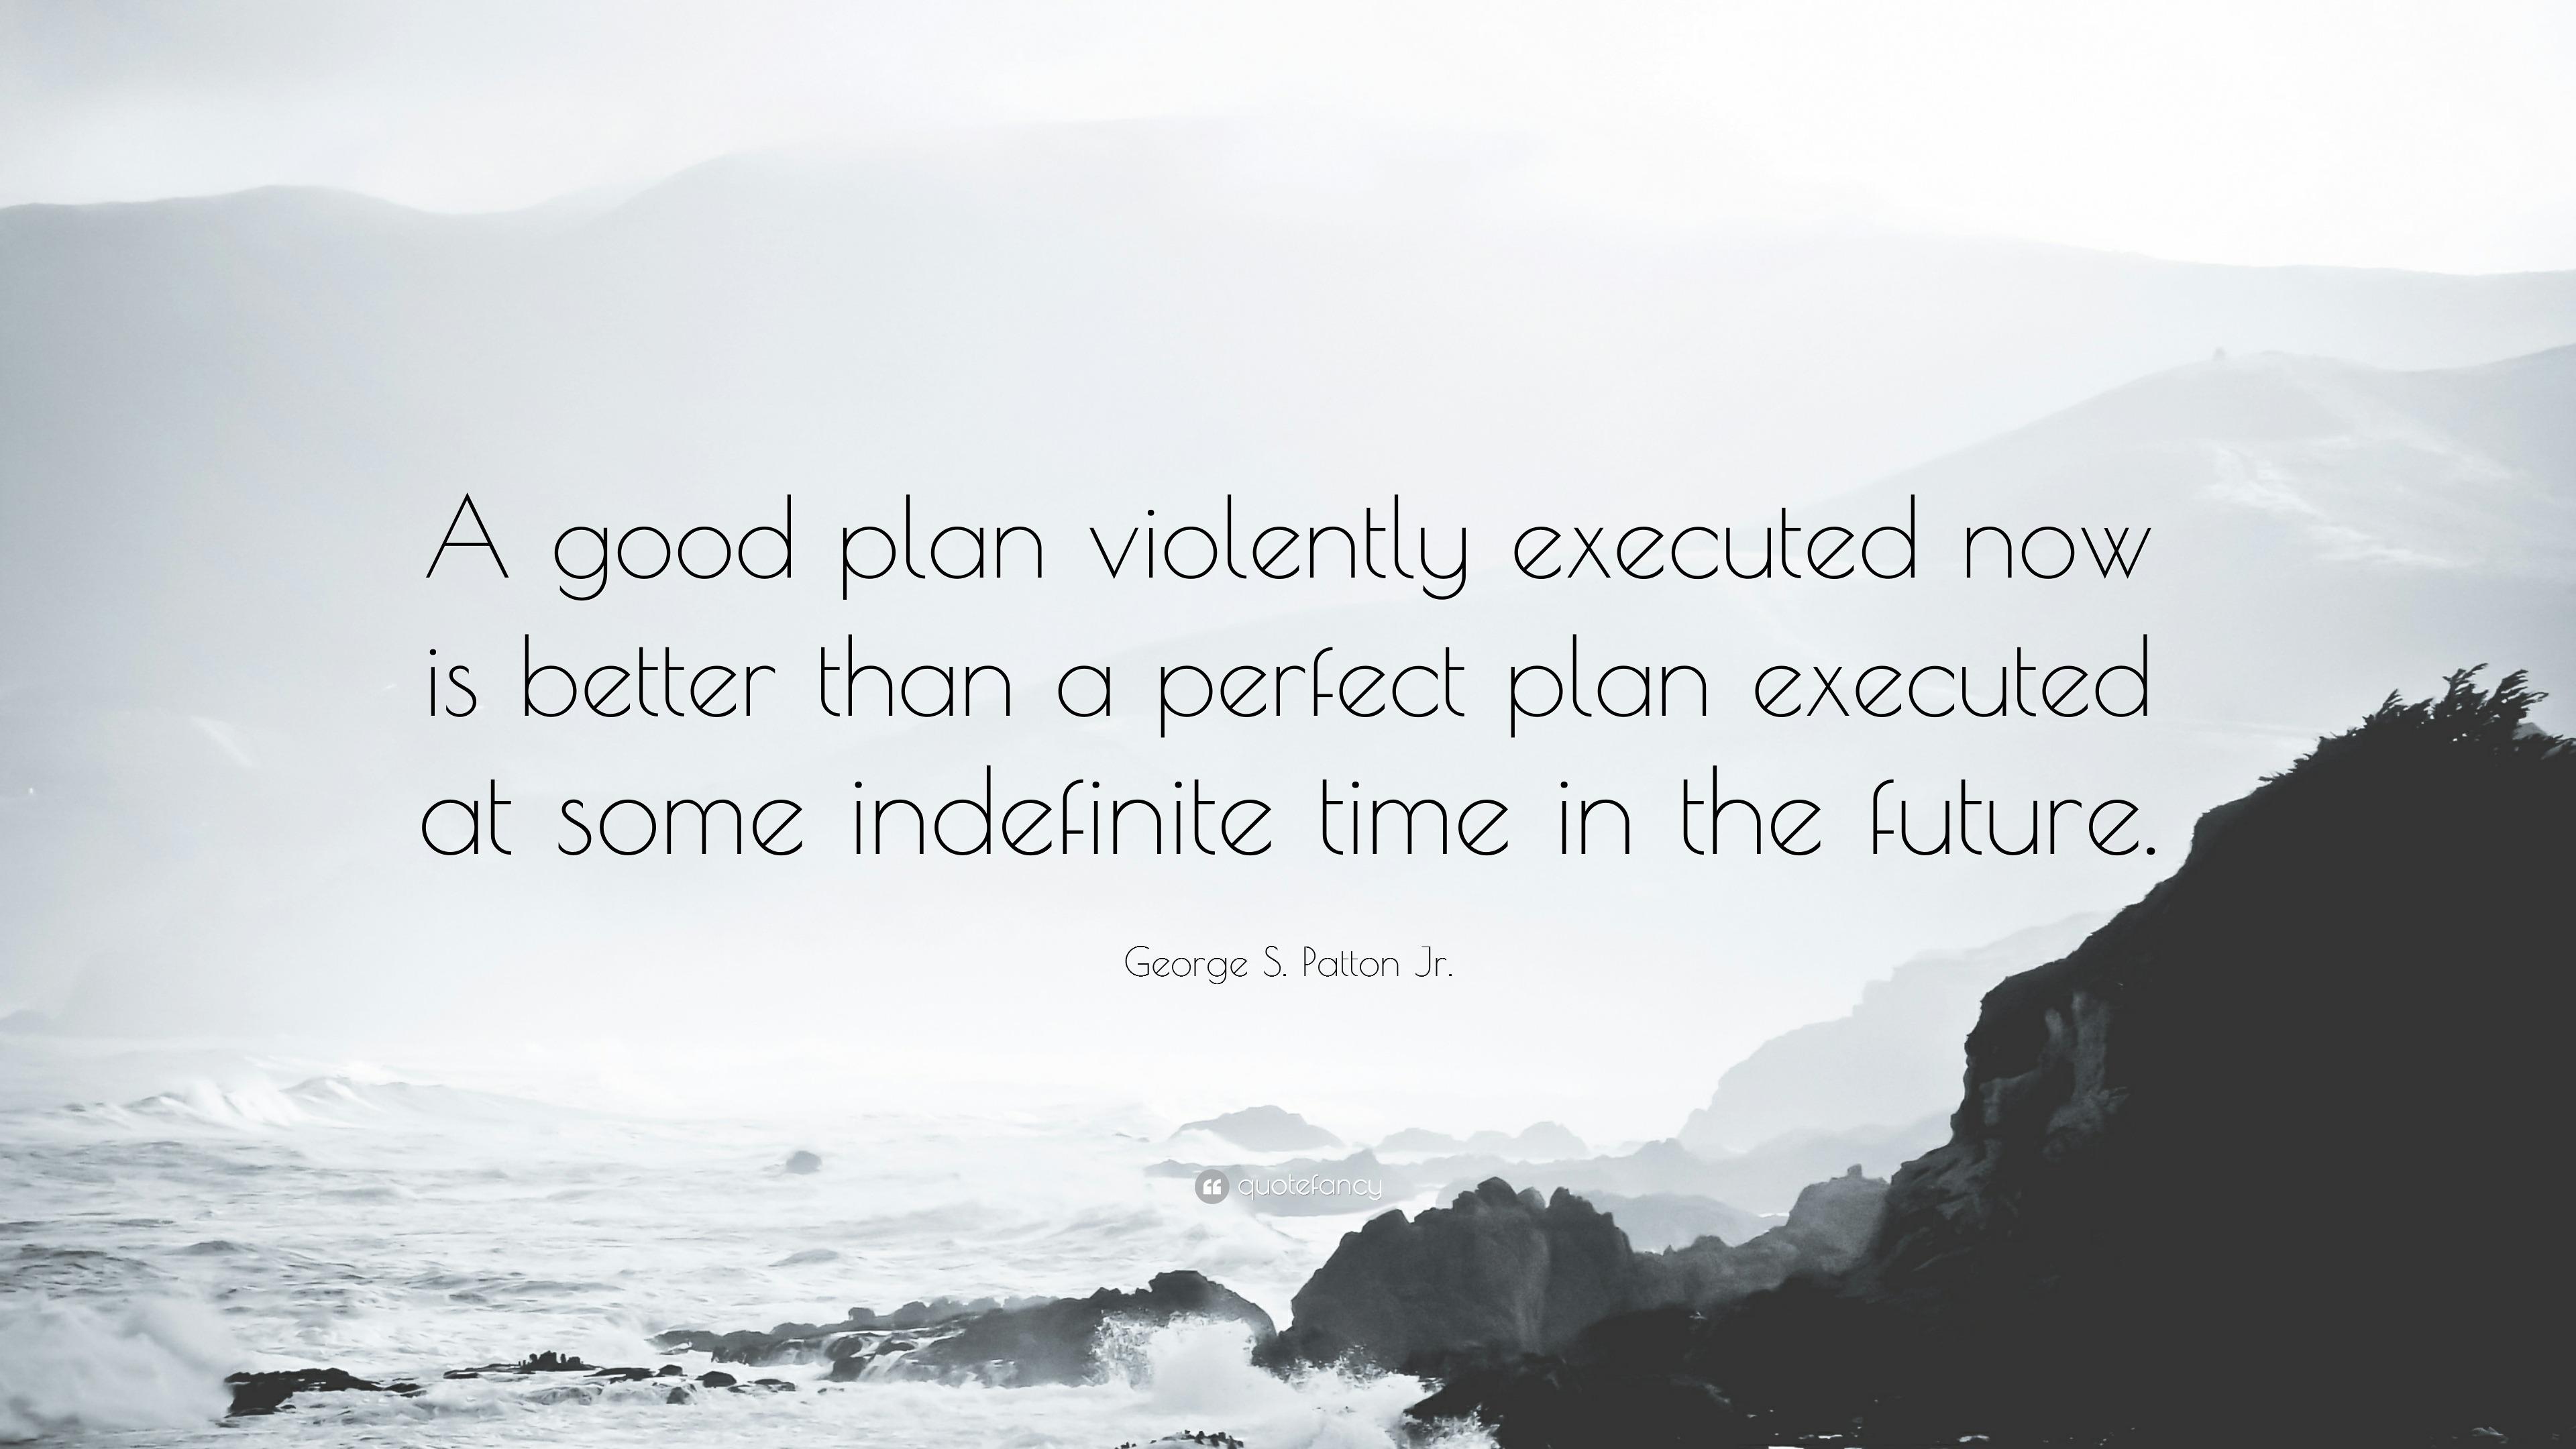 A good plan